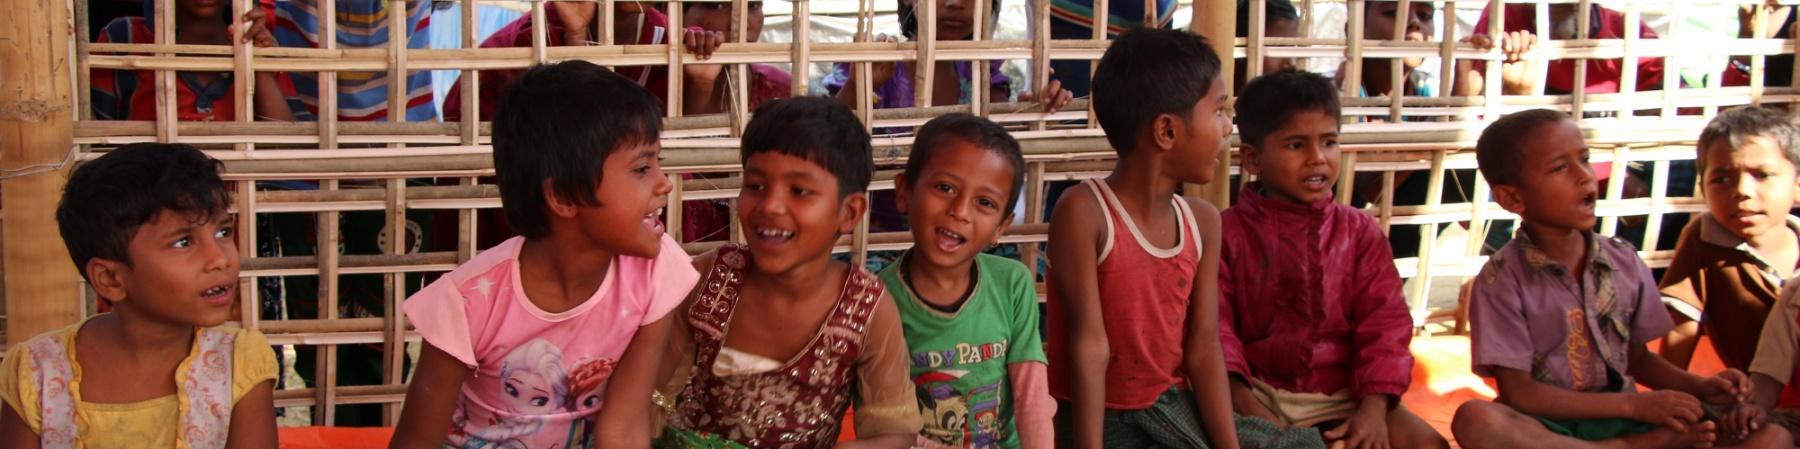 Bambini Rohingya Cox Bazar